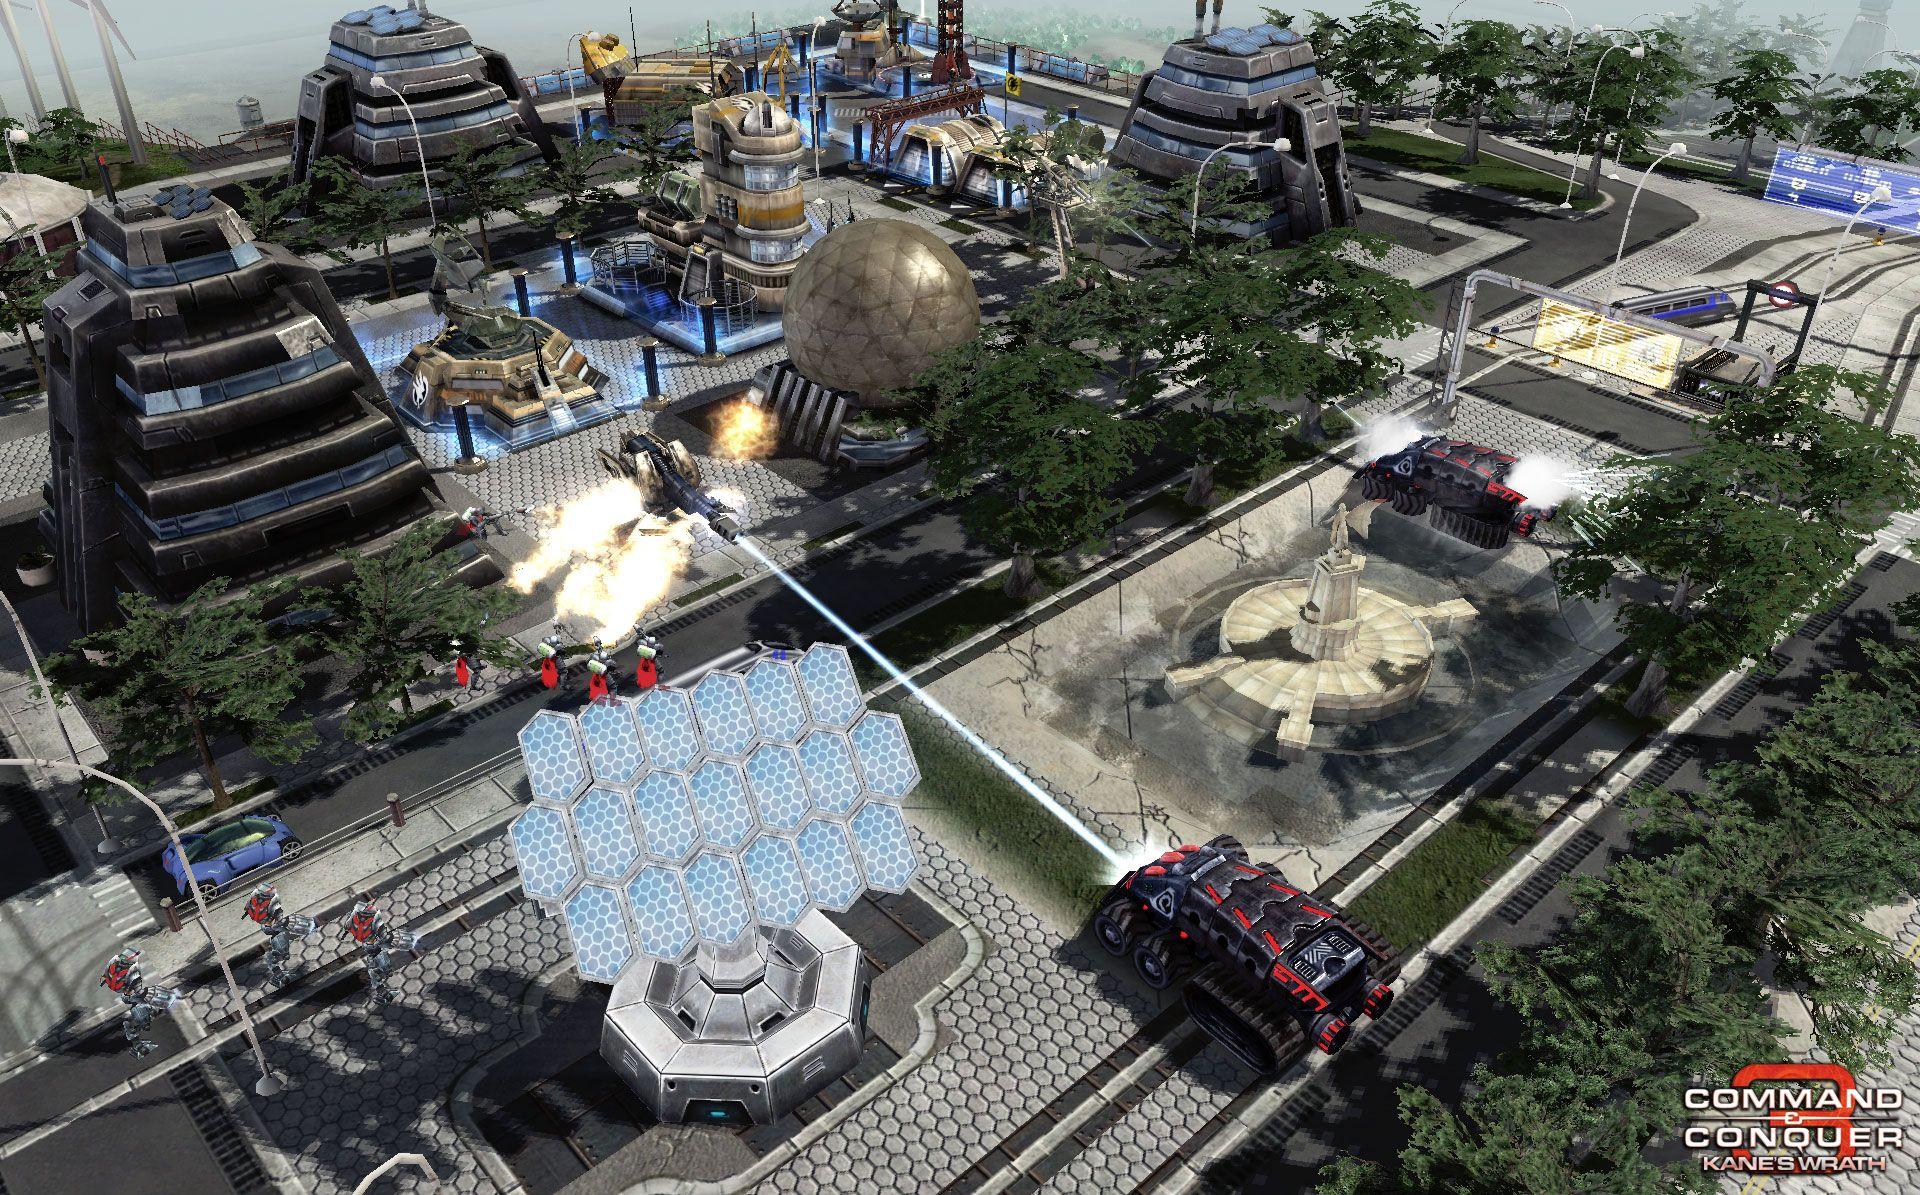 Command & Conquer 3(2 in 1)Tiberium Wars + Kane`s Wrath (RUS) .